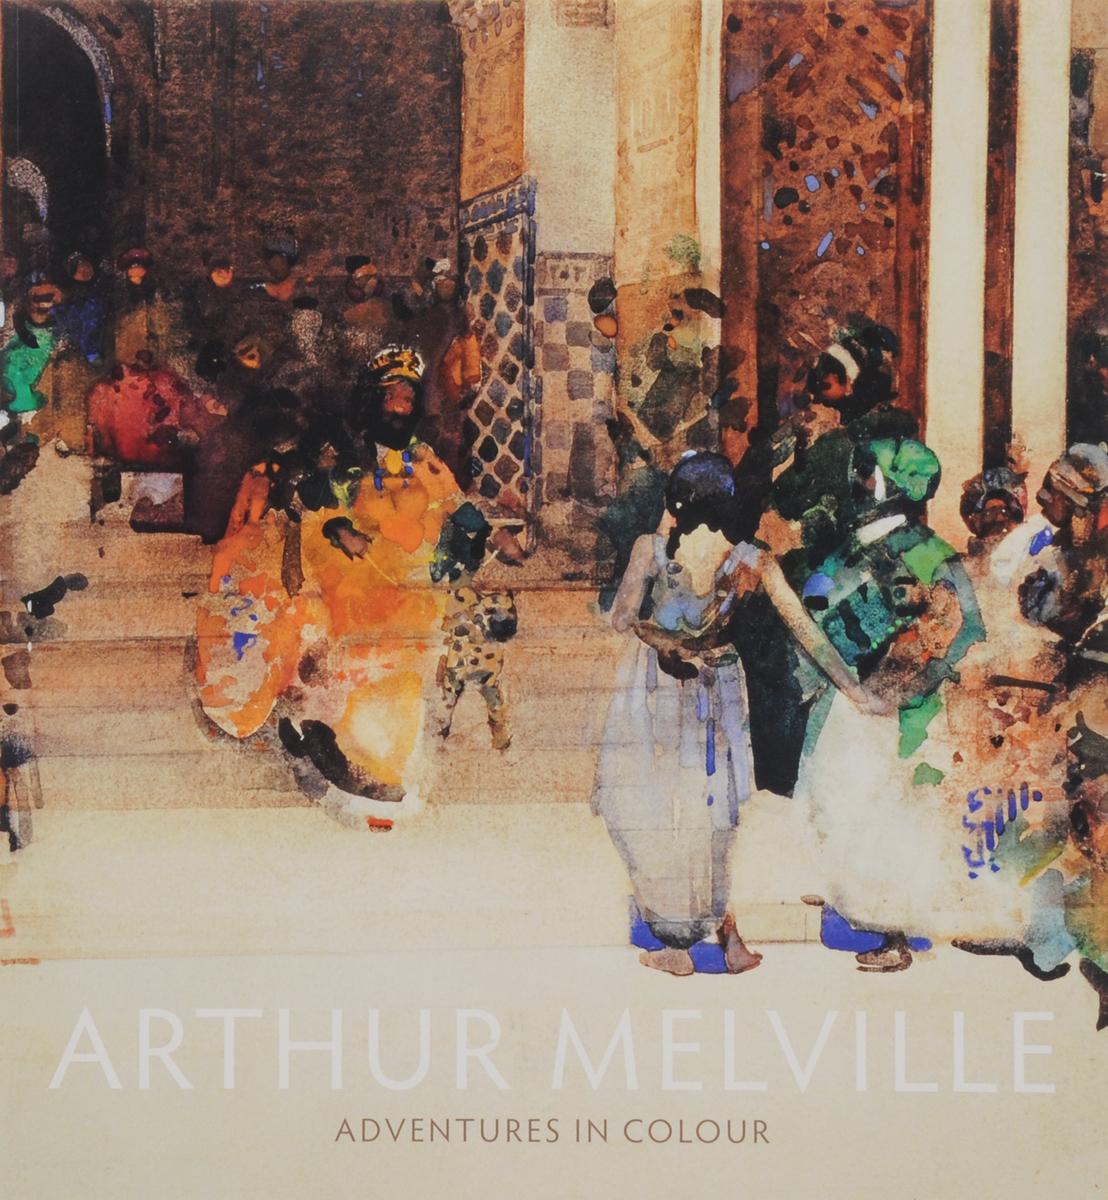 Arthur Melville new england textiles in the nineteenth century – profits